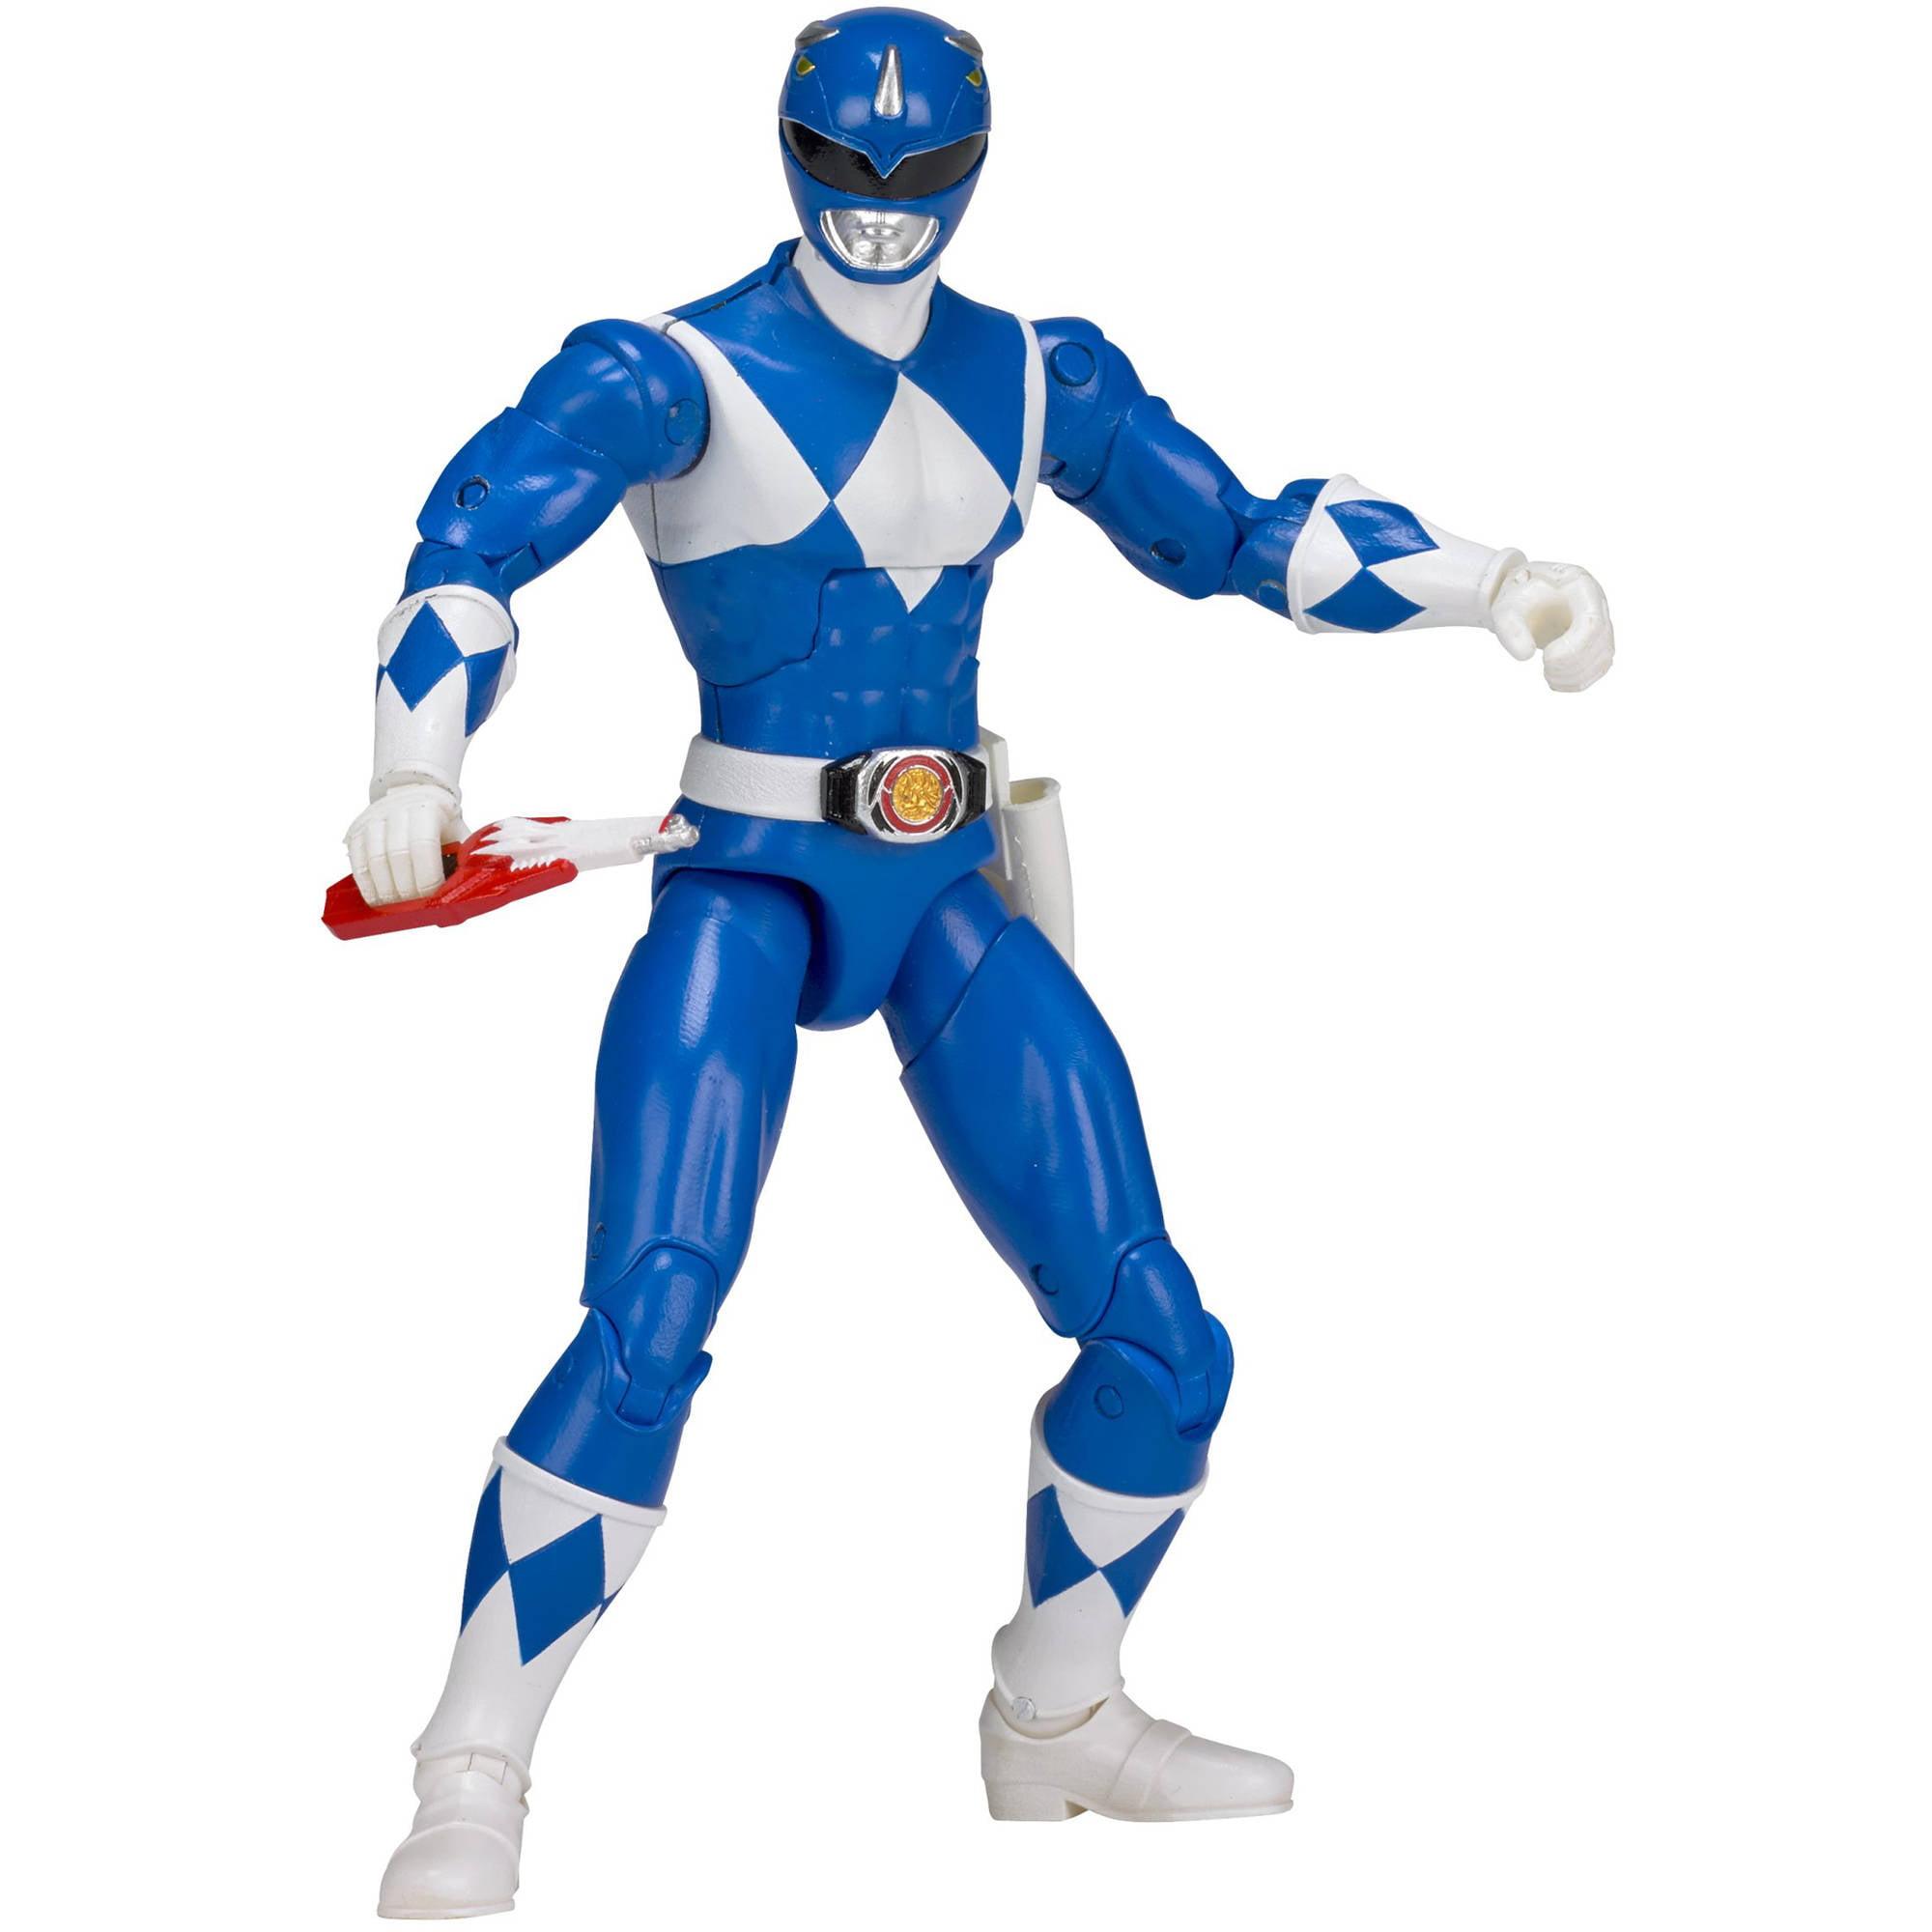 Power Rangers Legacy Mighty Morphin Blue Ranger